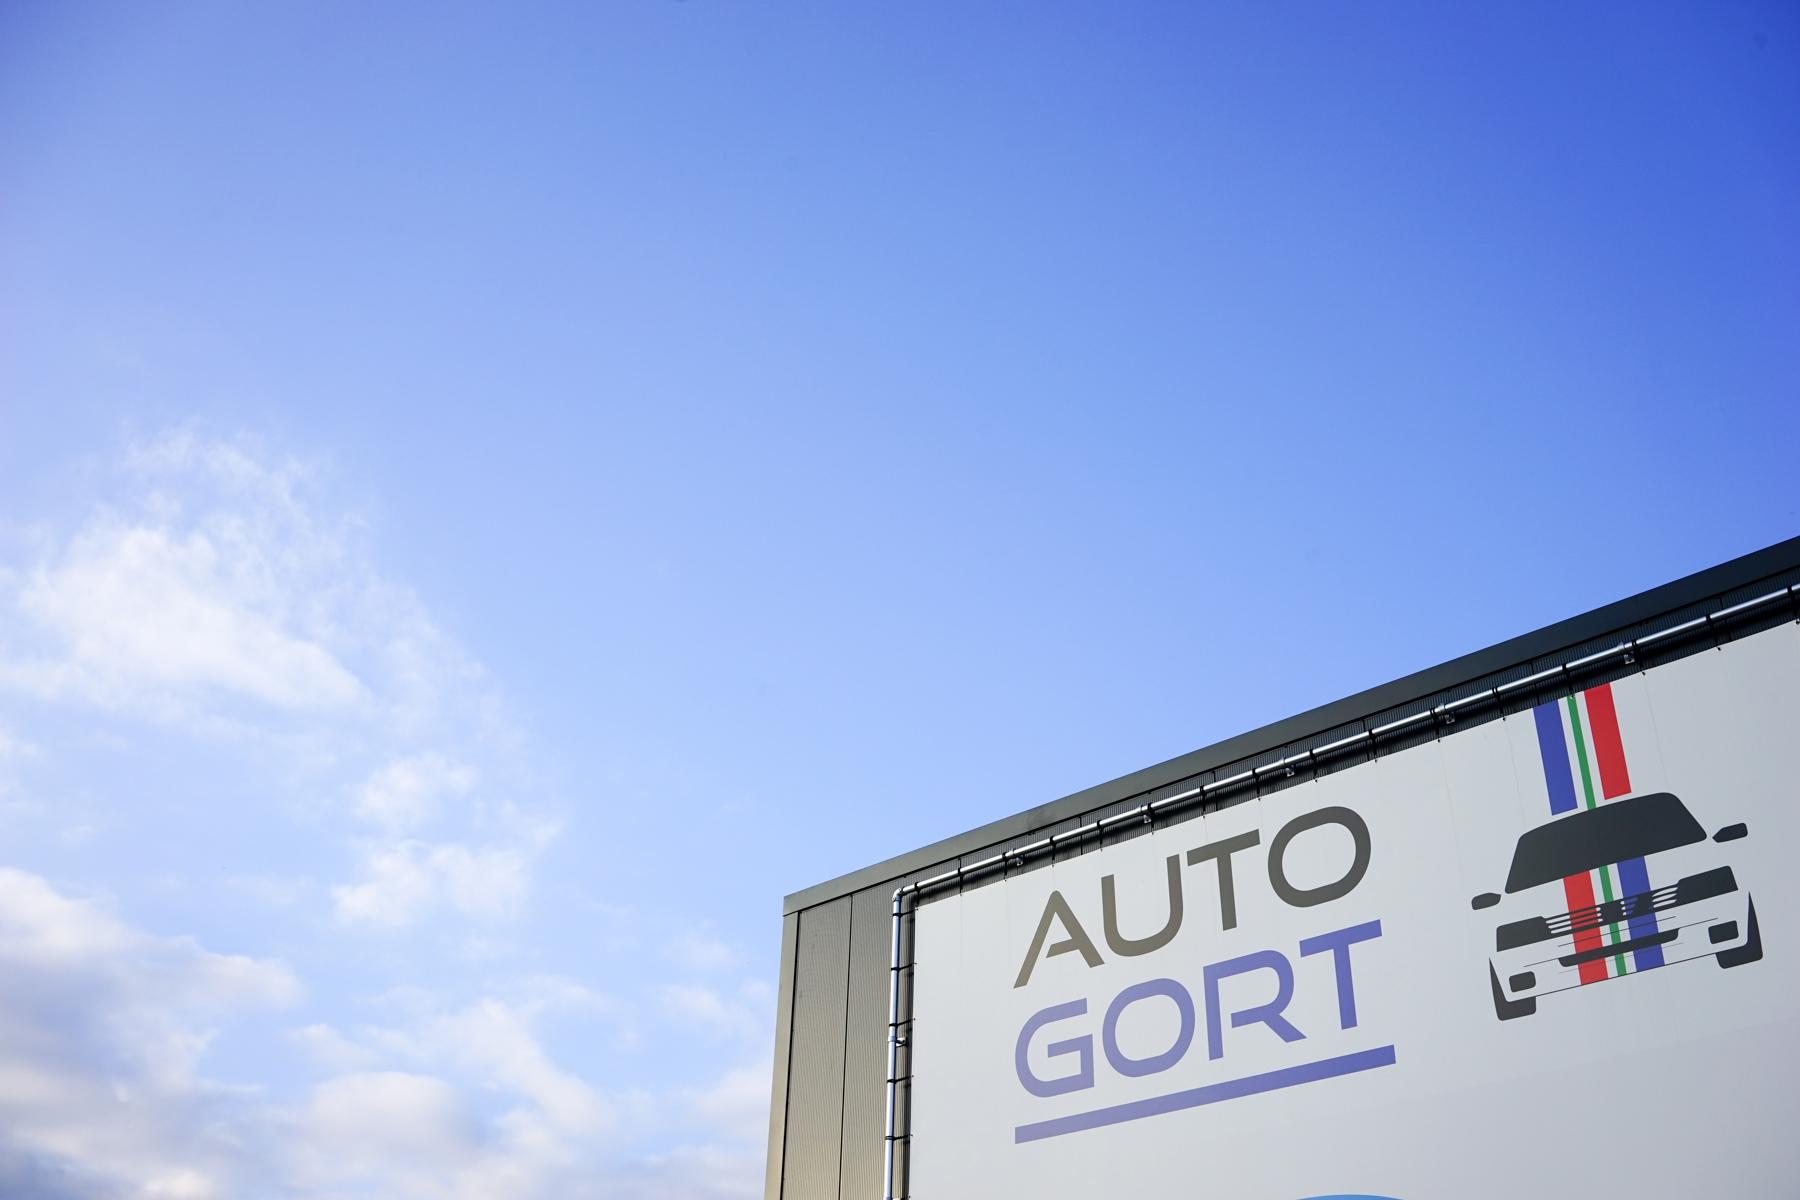 Auto Gort logo